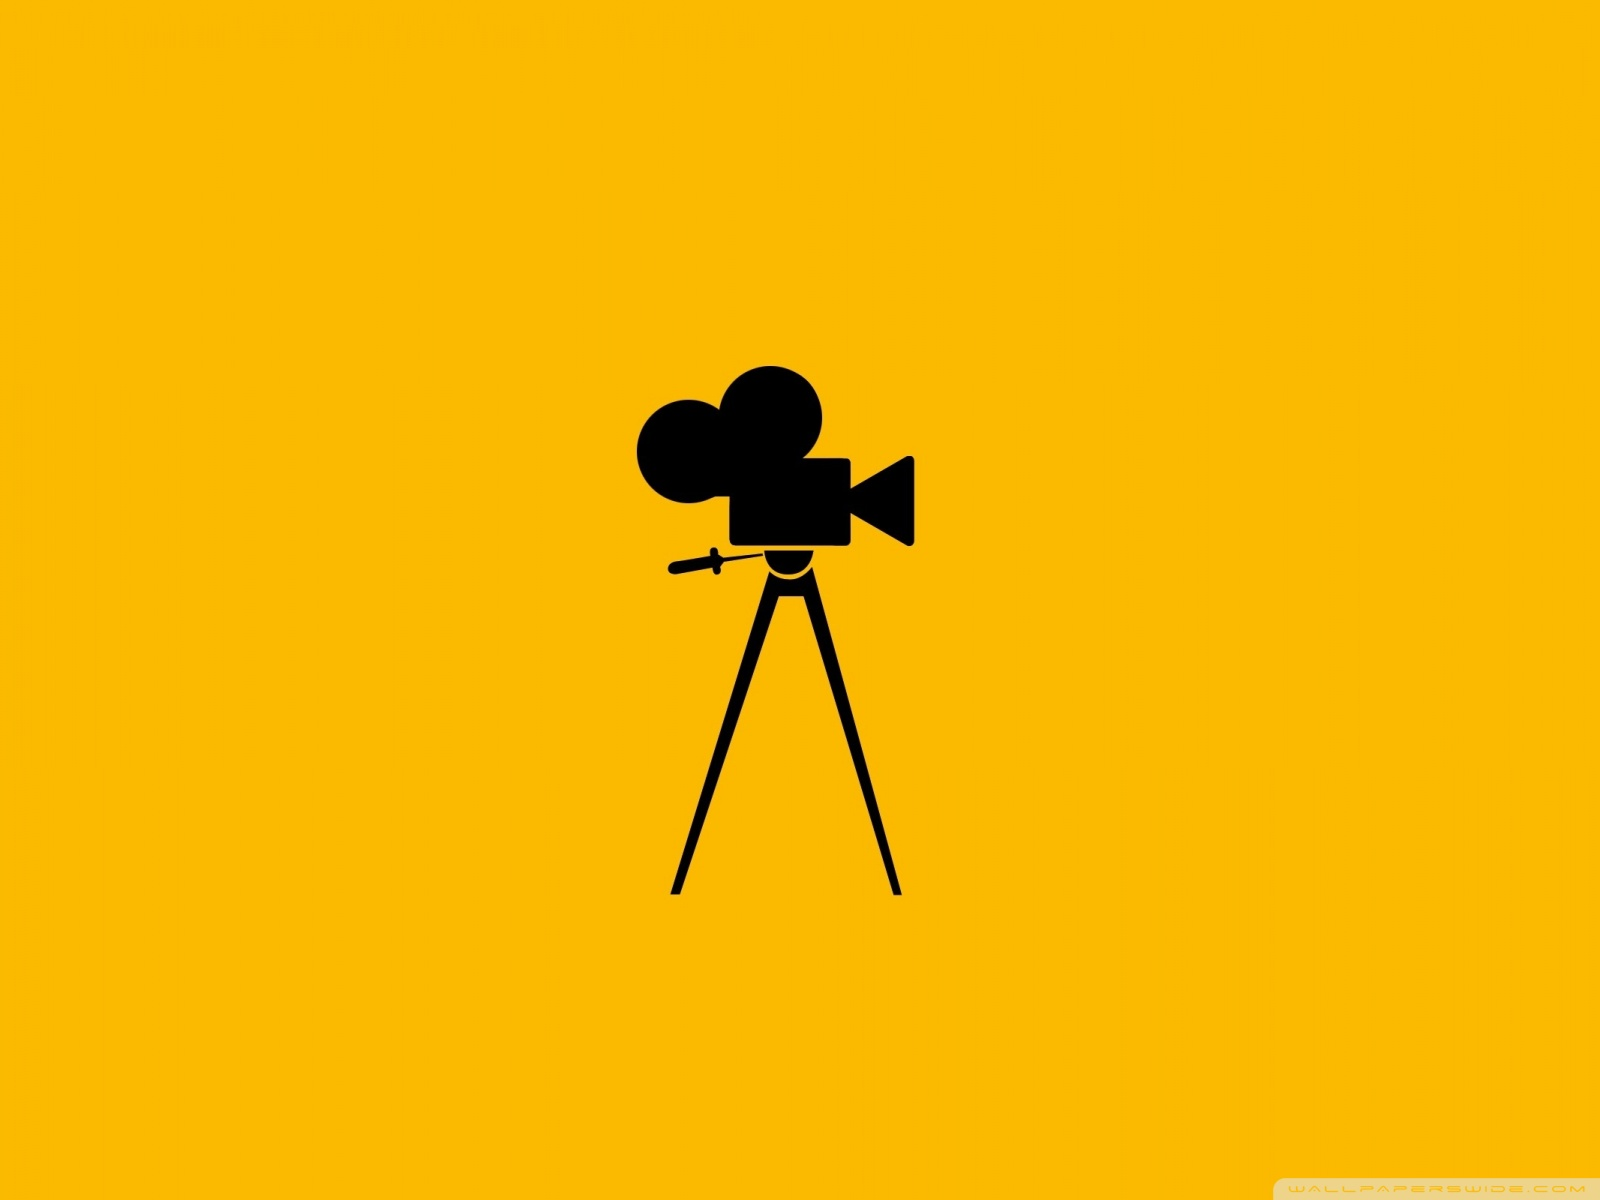 Film Camera Ultra HD Desktop Background Wallpaper for 4K UHD TV 1600x1200